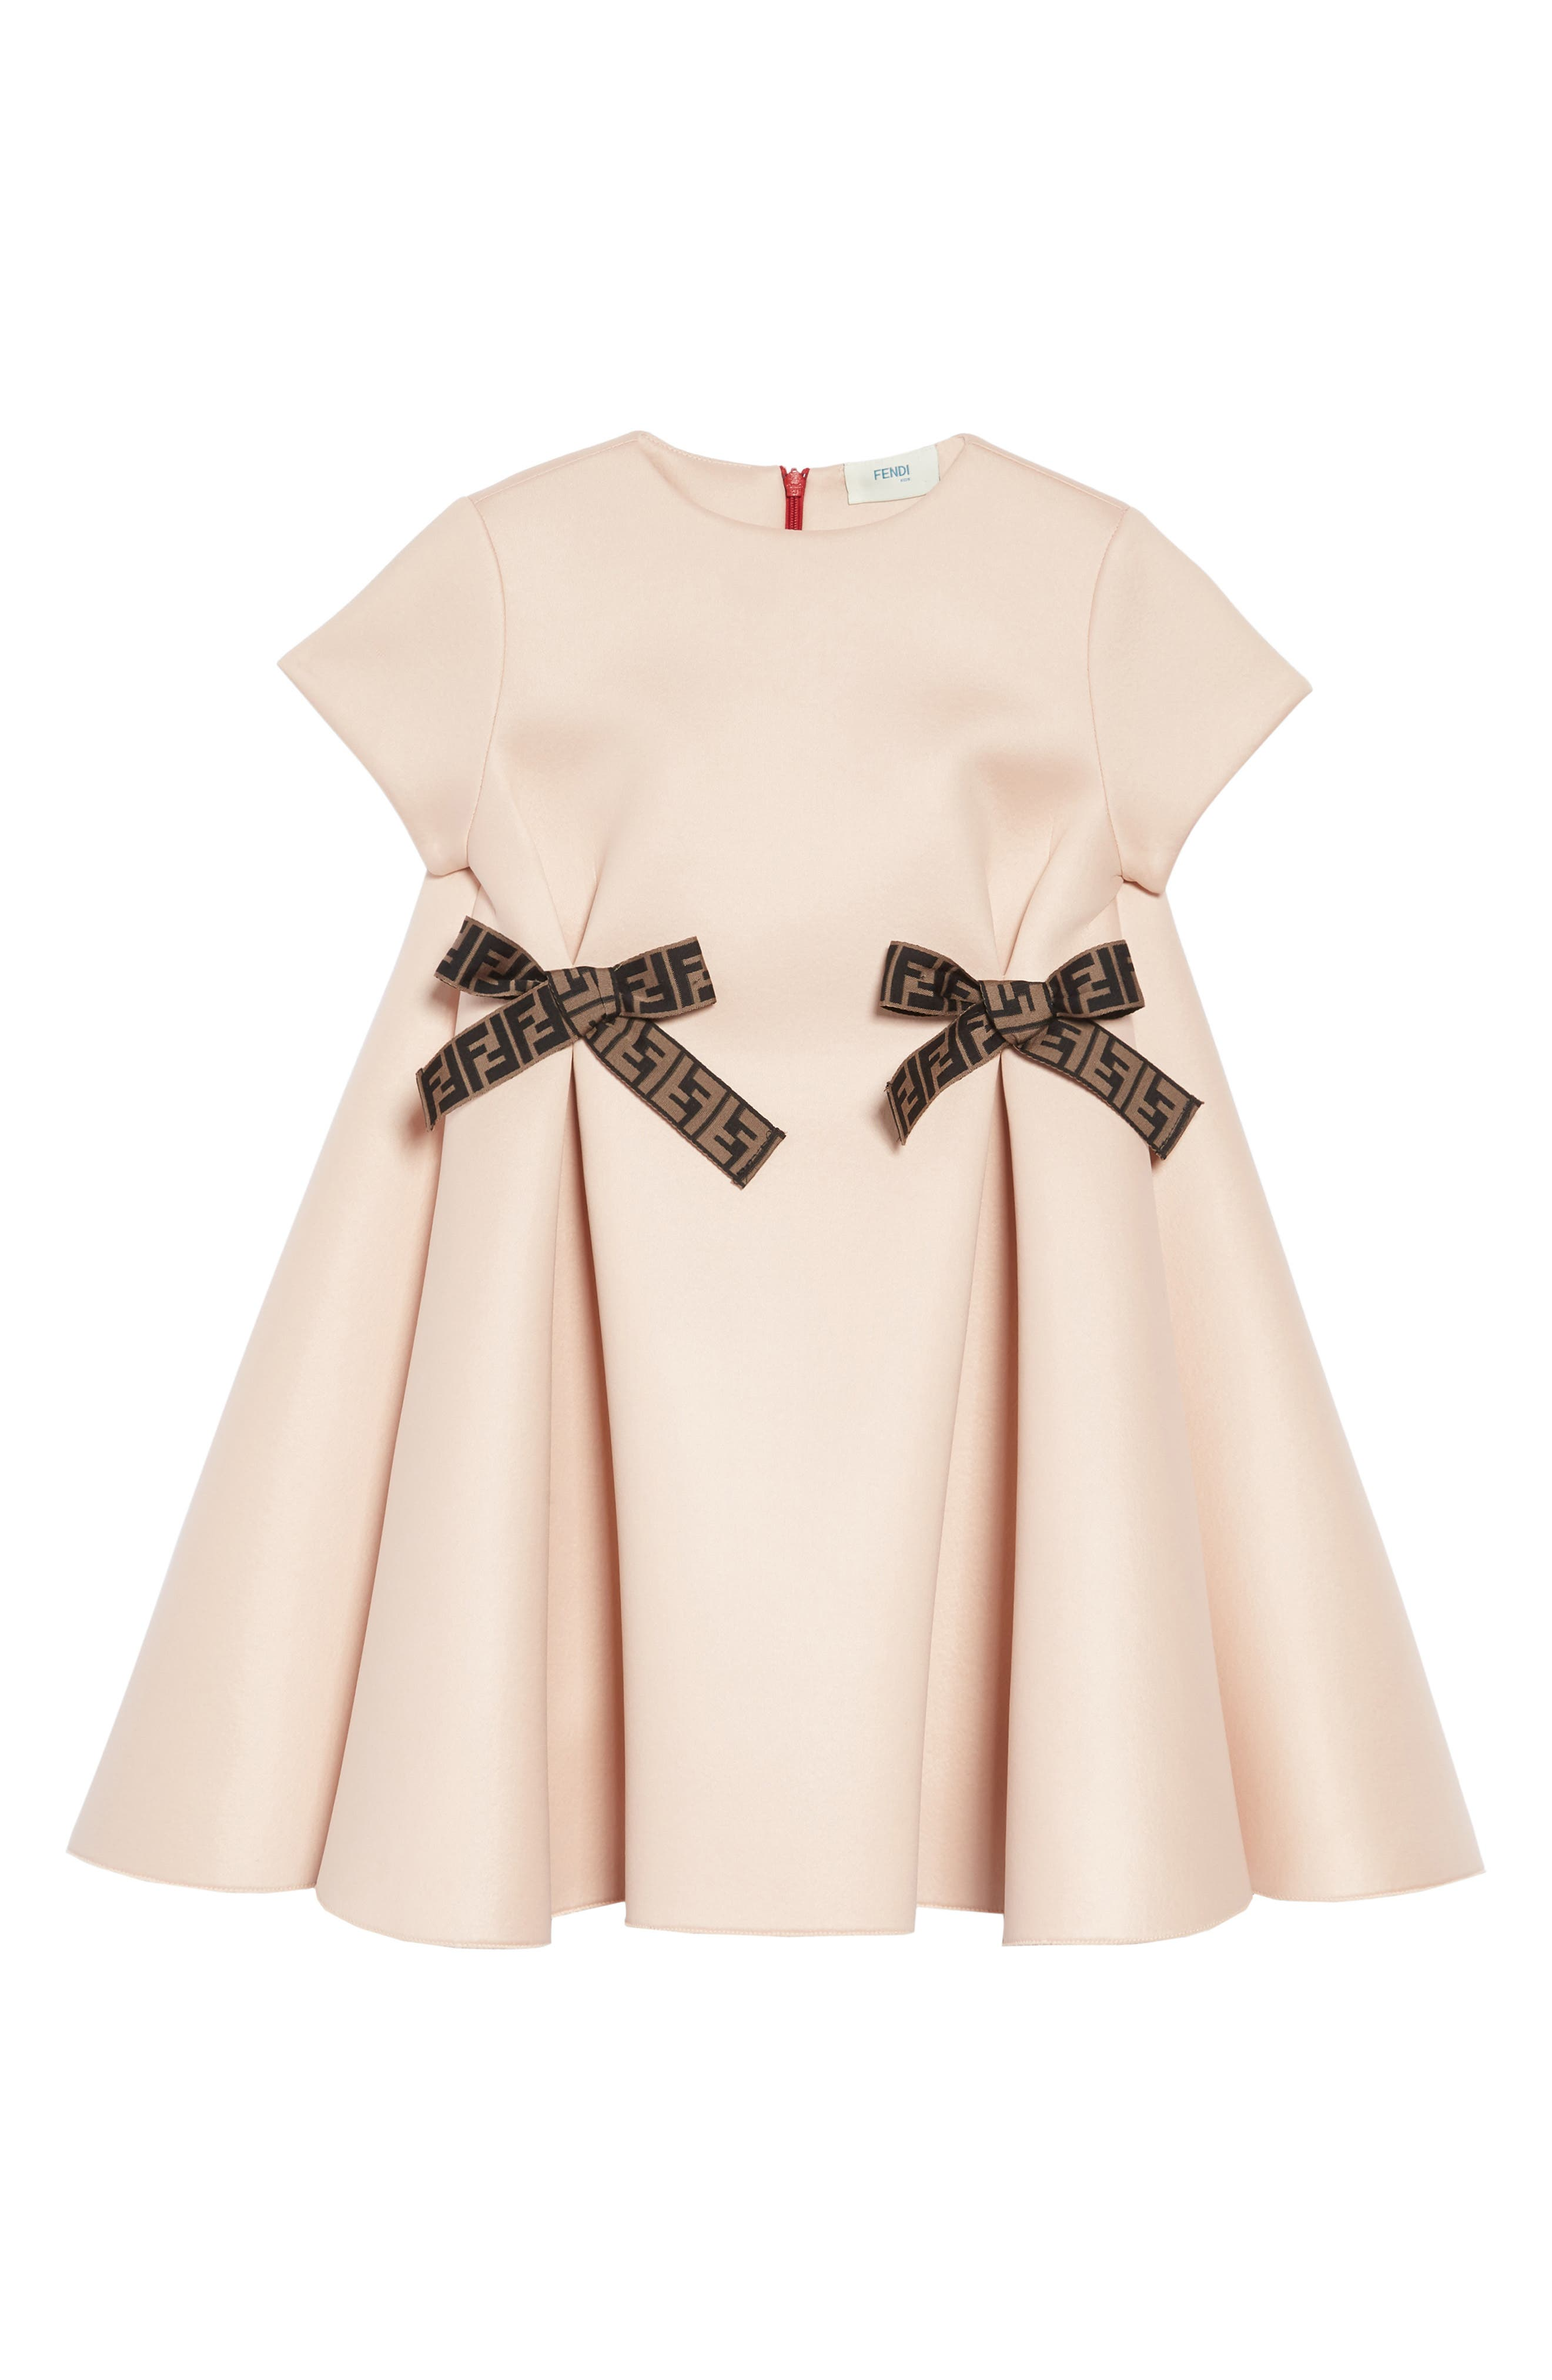 FENDI, Bow Detail Dress, Main thumbnail 1, color, F0JE6 PEACH